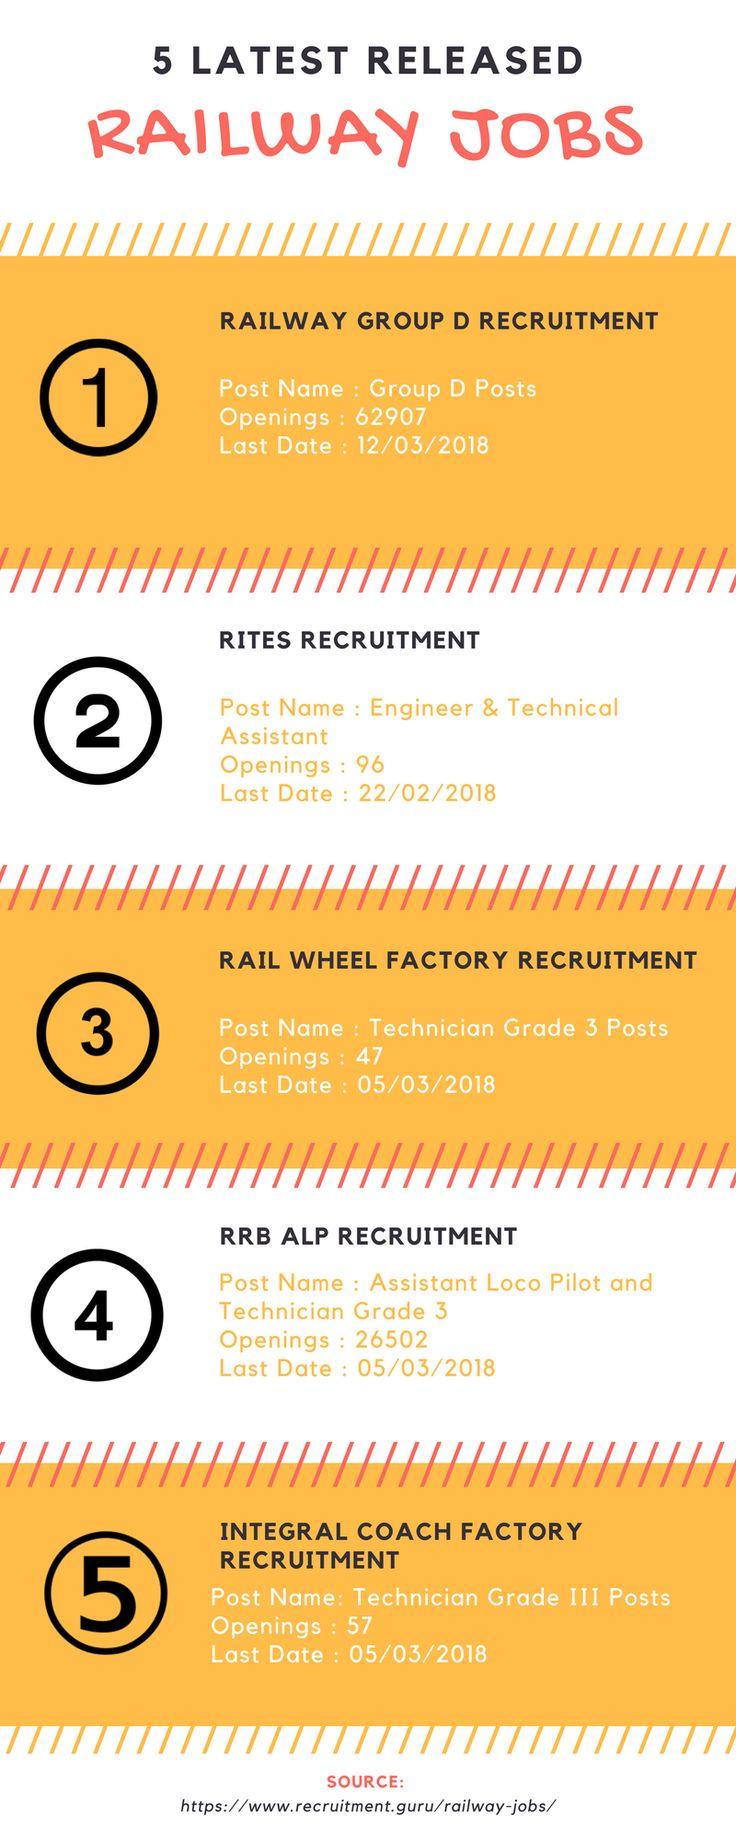 Best 25 railway jobs ideas on pinterest old navy job check out latest released indian railway jobs 2018 buycottarizona